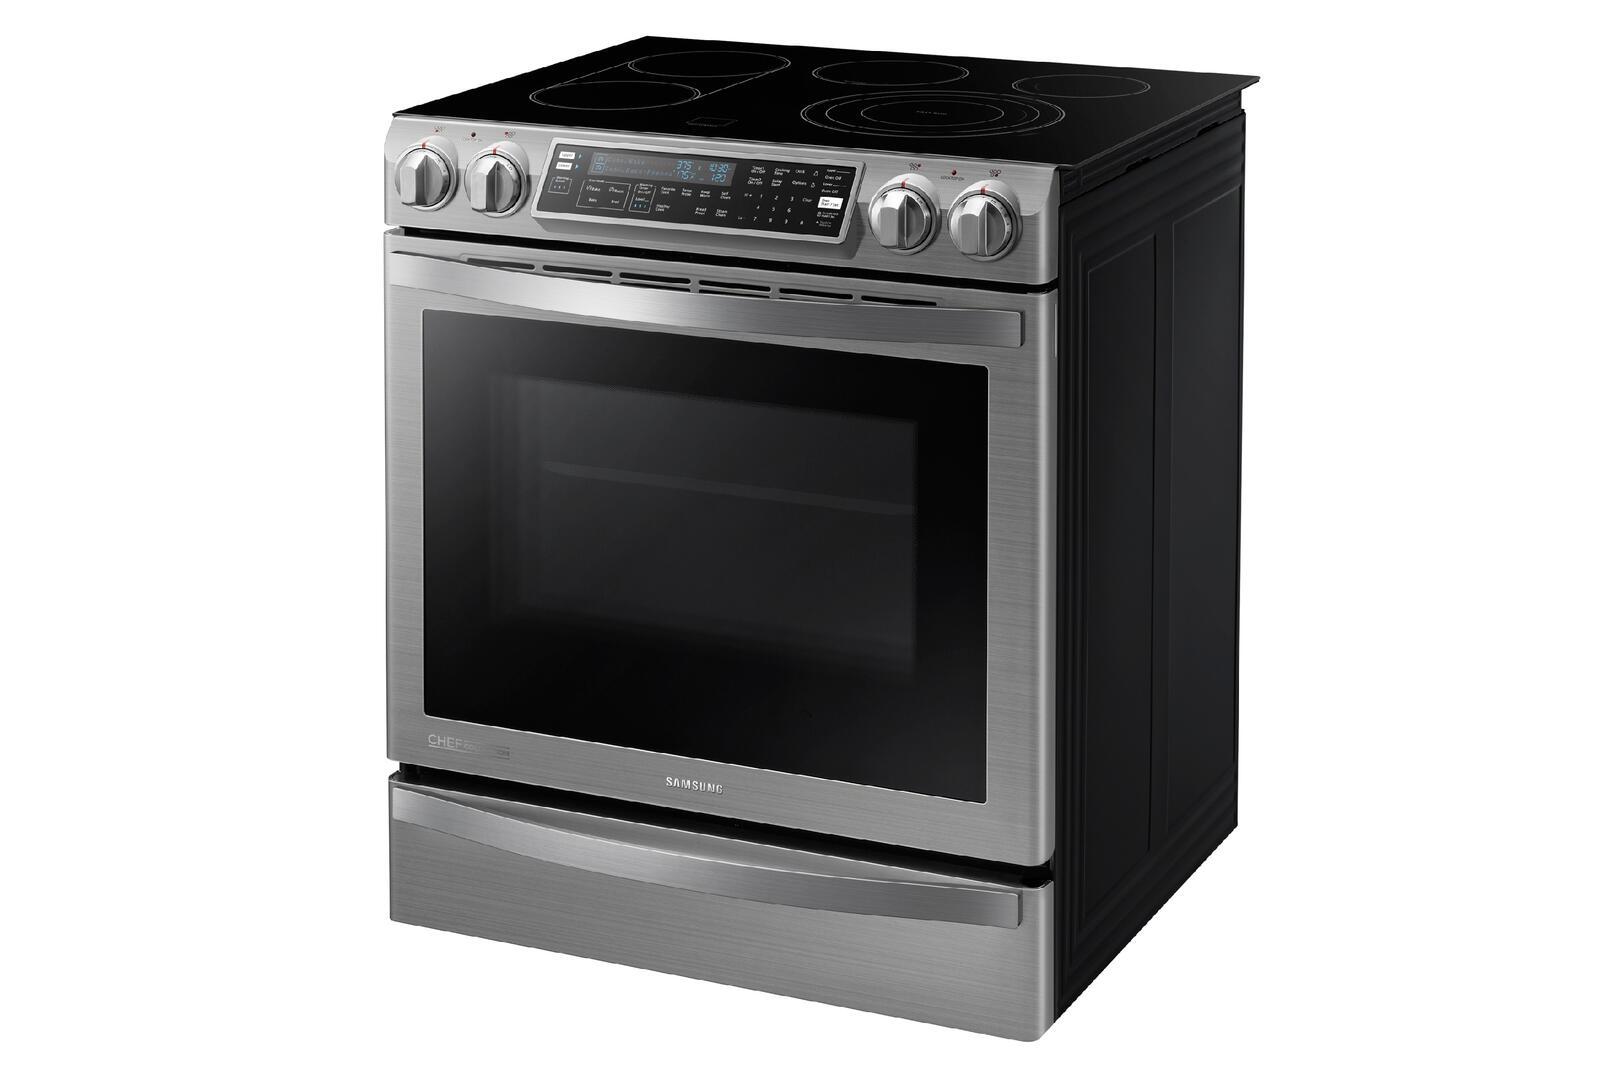 Uncategorized. Top Chef Kitchen Appliances. jamesmcavoybr Home Design